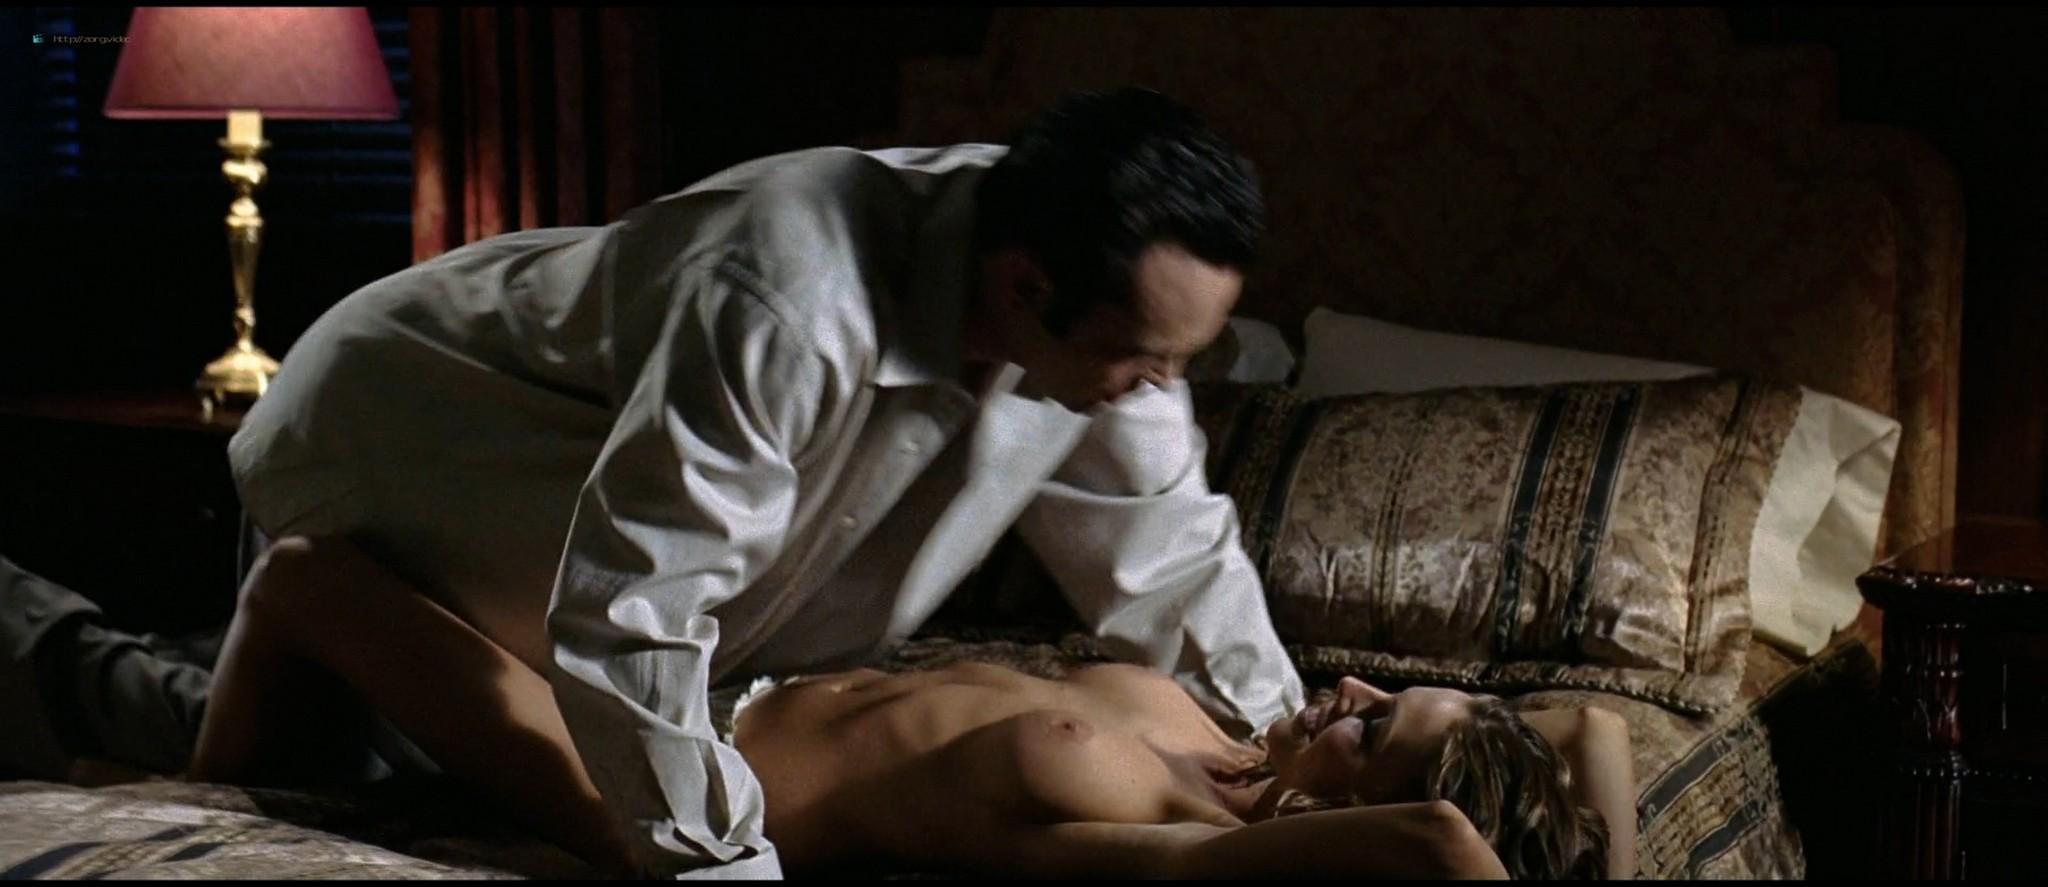 Diora Baird nude topless huge boobs others nude too - Wedding Crashers (2005) HD 1080p BluRay (9)